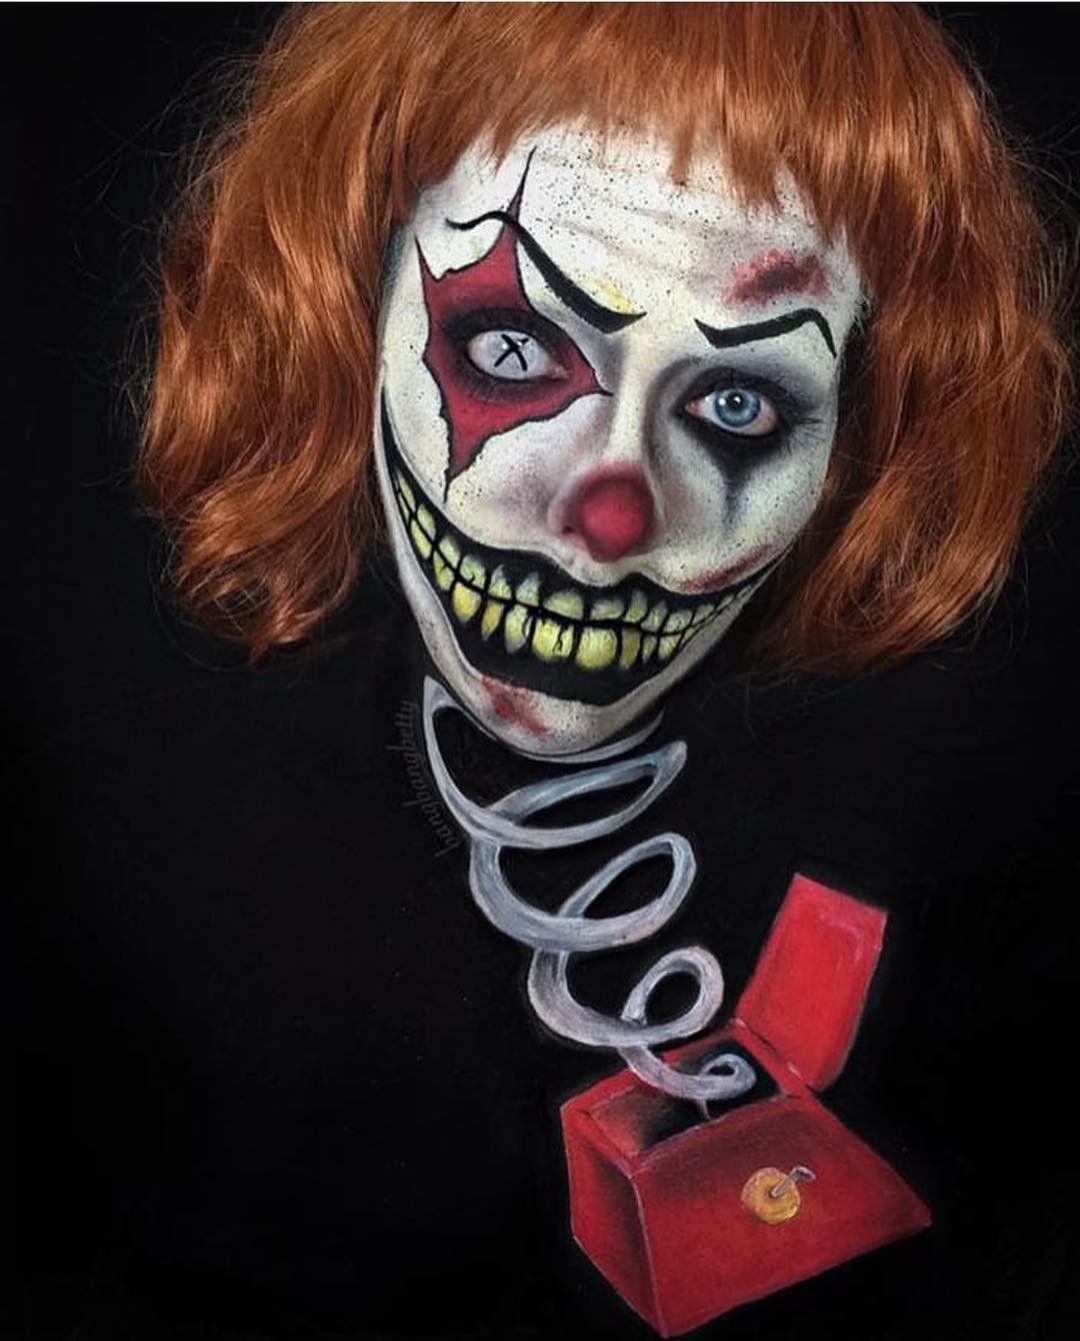 Halloweenmakeup halloween2018 halloween makeup arts